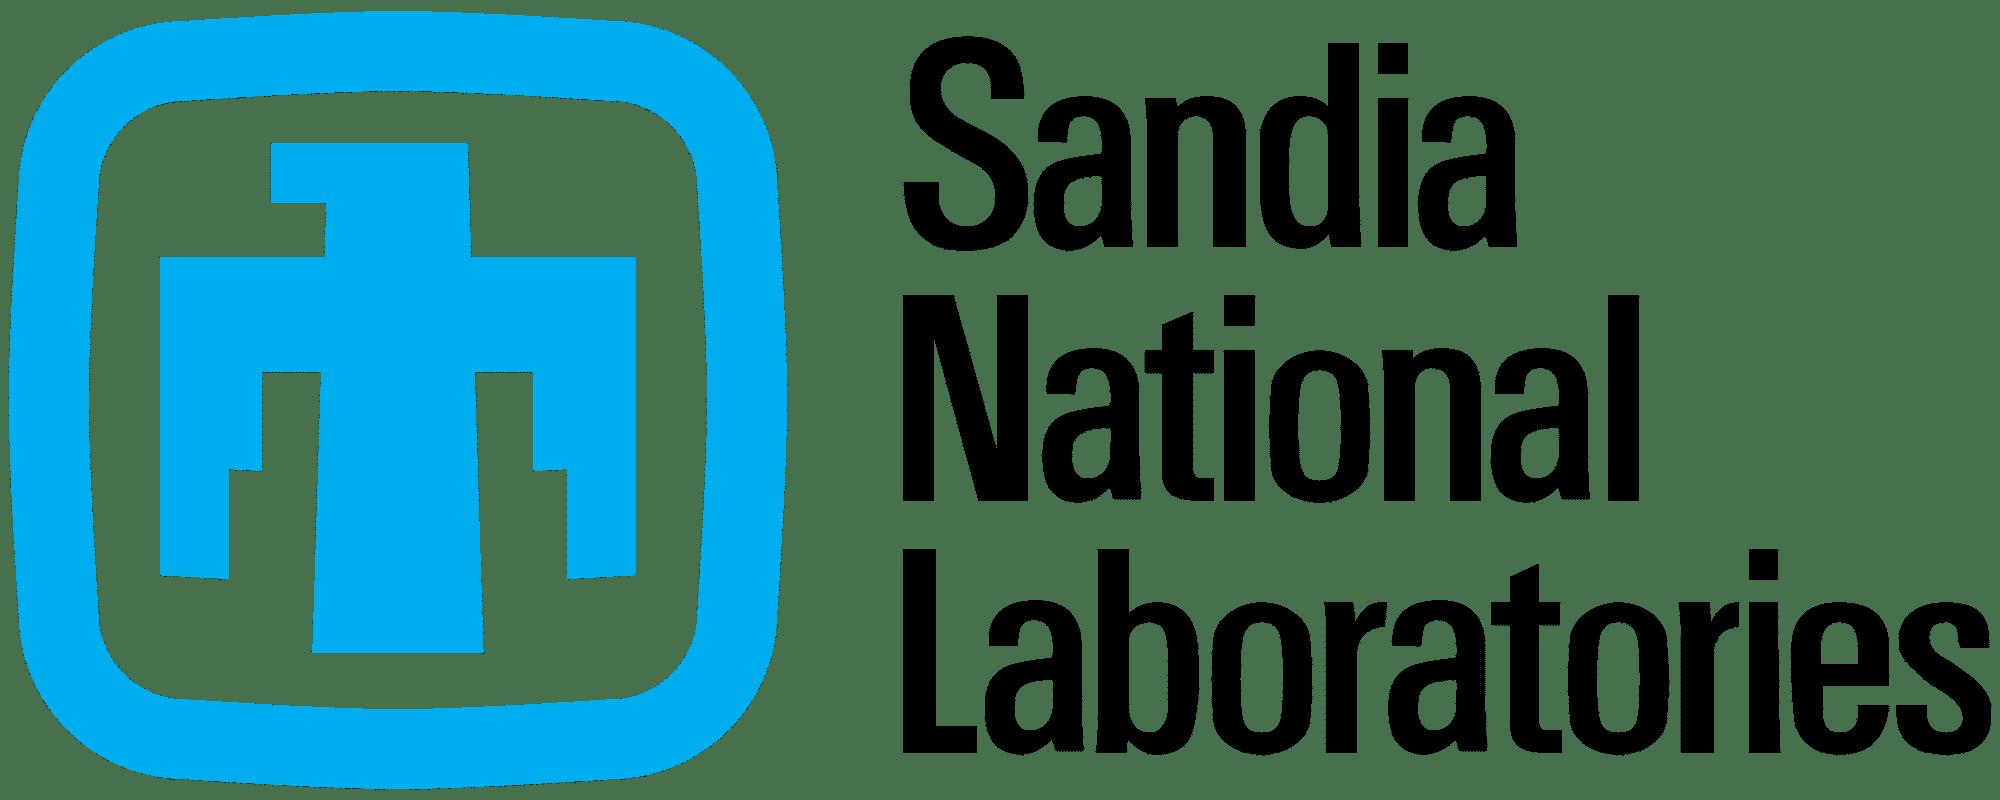 https://ljist.com/wp-content/uploads/2018/02/Sandia-Logo.png